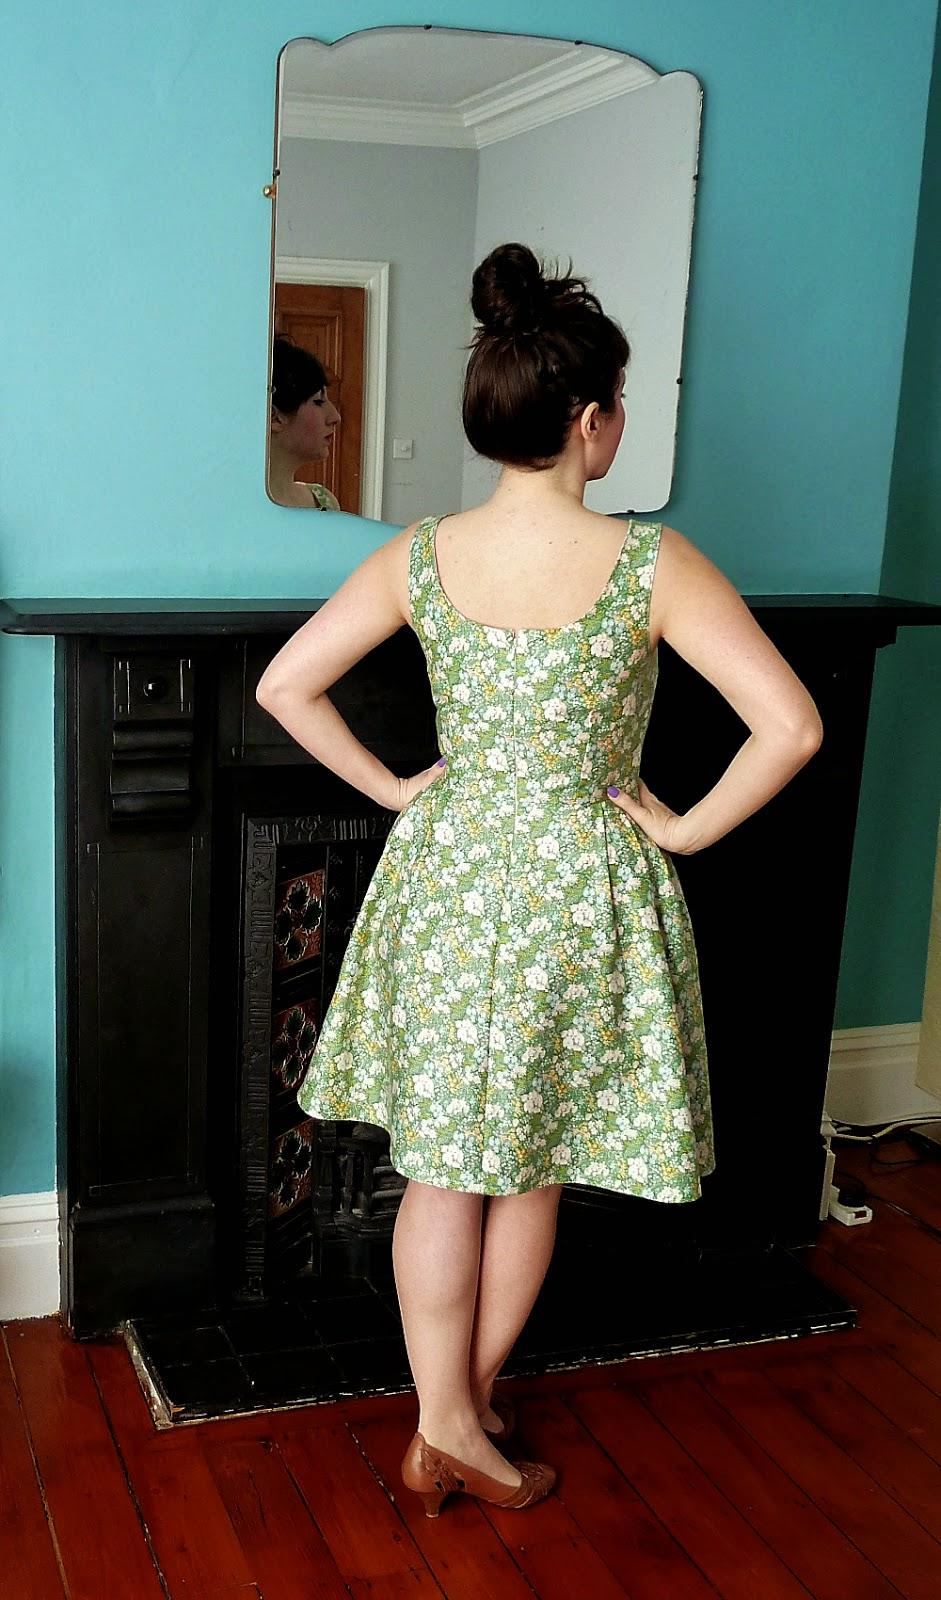 Chintzy Floral Lilou Dress - A Stitching Odyssey